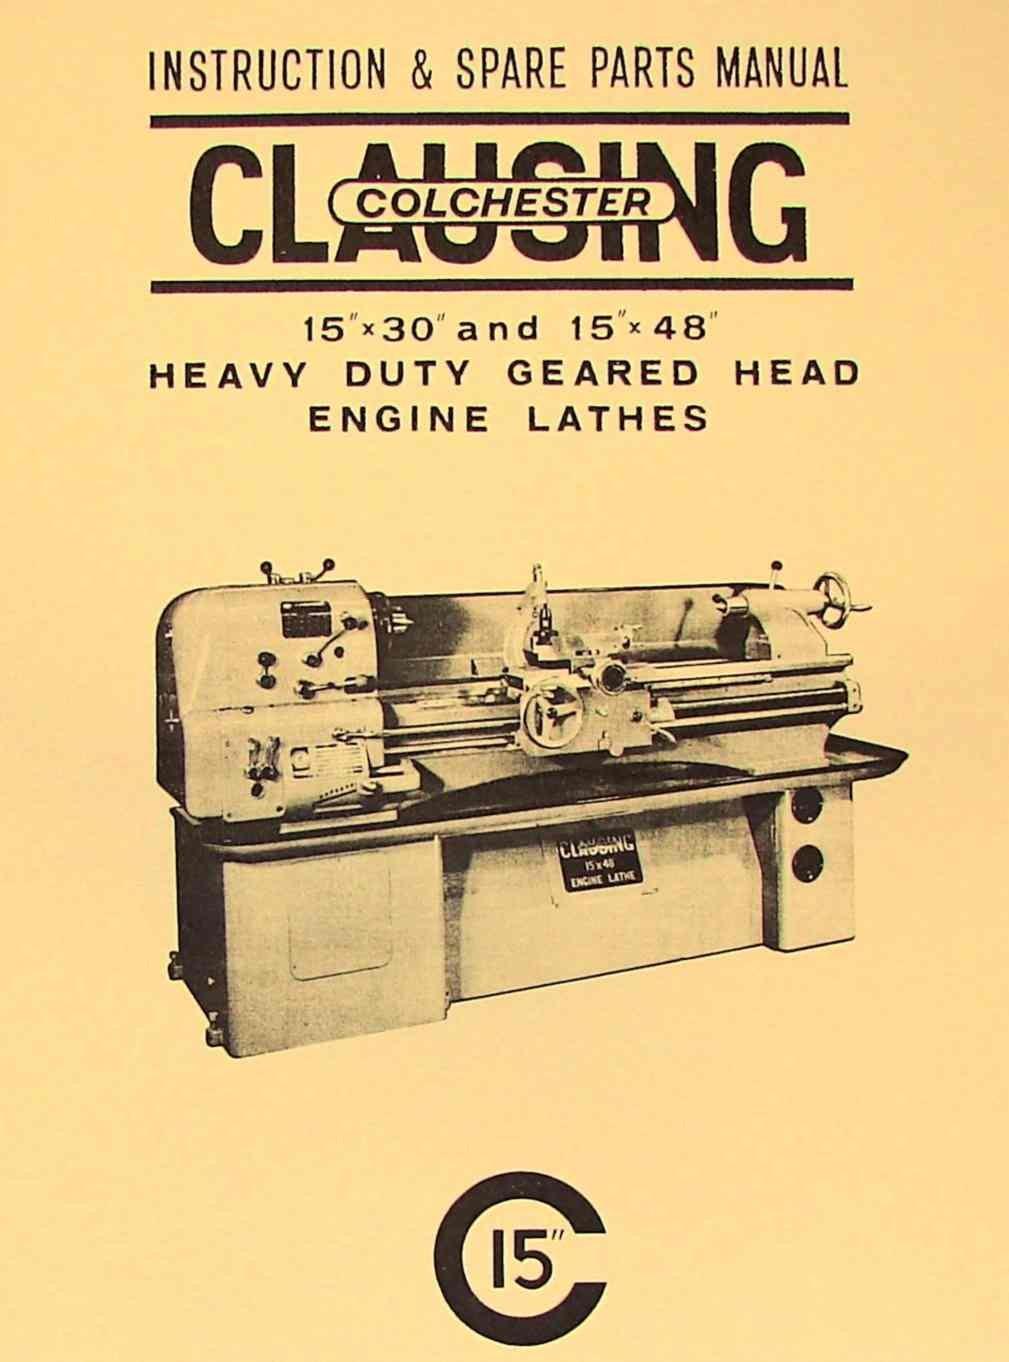 "CLAUSING-Colchester 15""x30"" & 15""x48"" Metal Lathe Instruction & Part Manual:  Misc.: Amazon.com: Books"